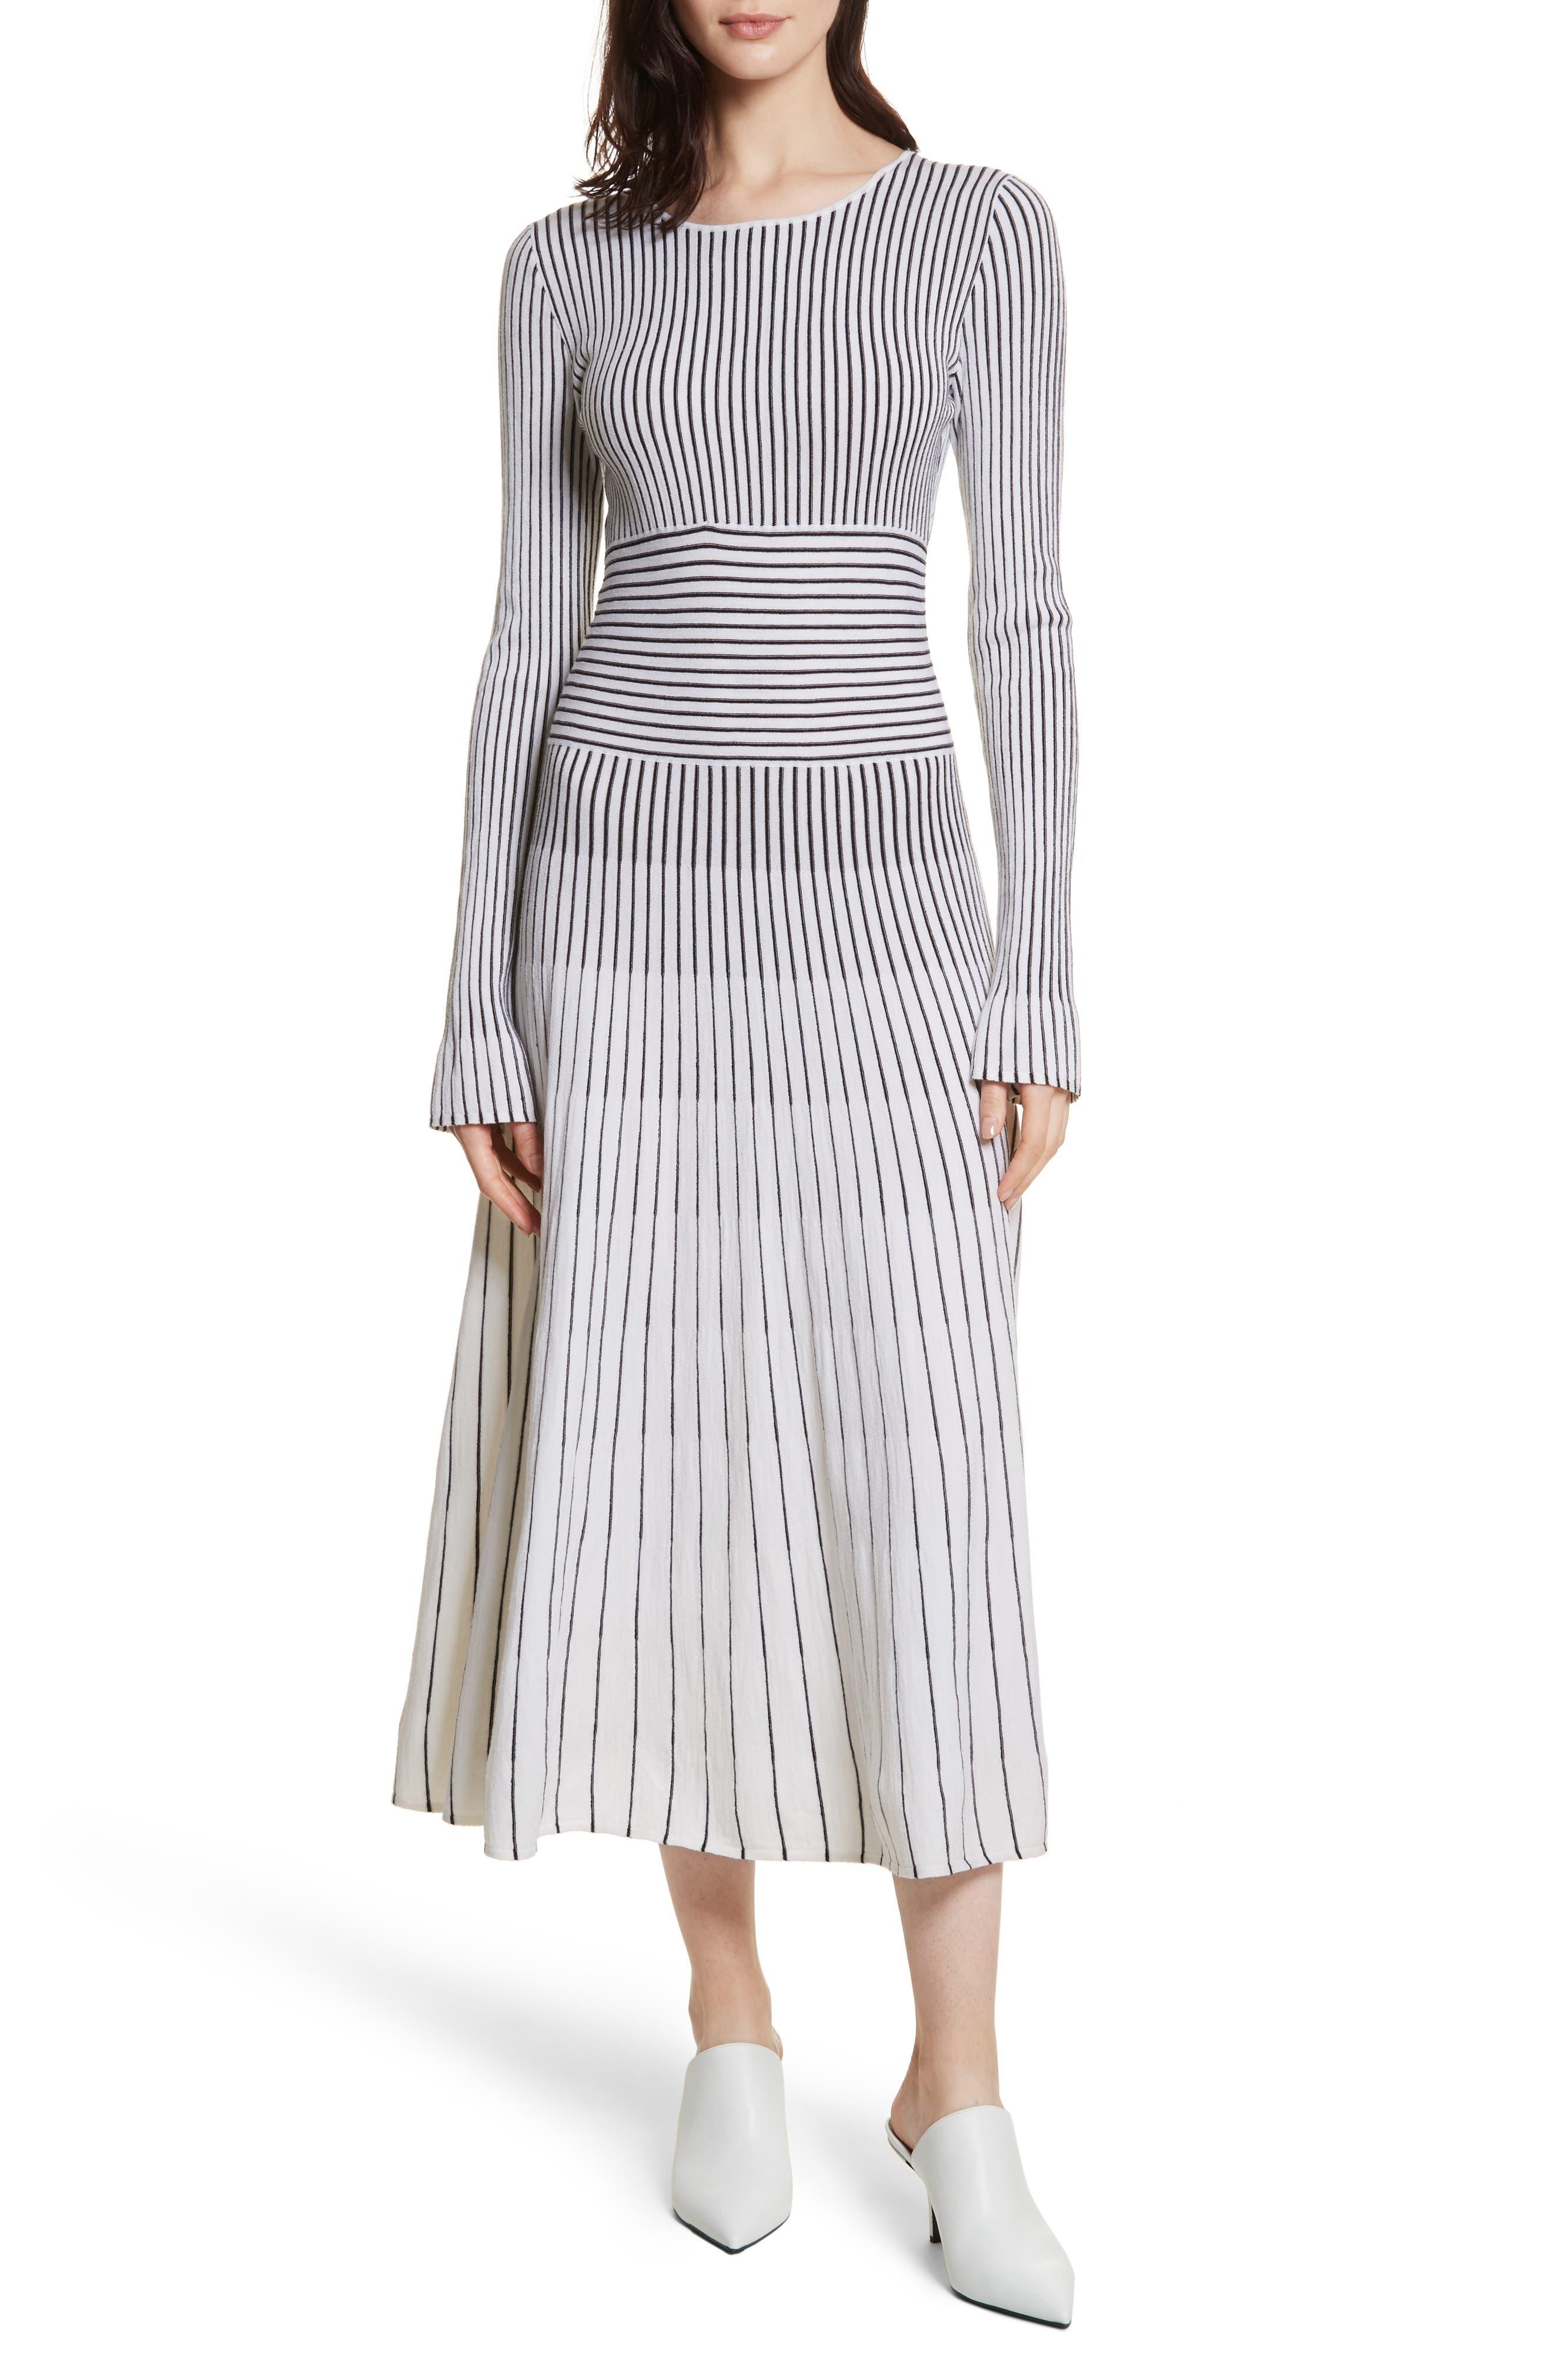 Sheridan Stripe Knit Midi Dress,                         Main,                         color, Ivory/ Black